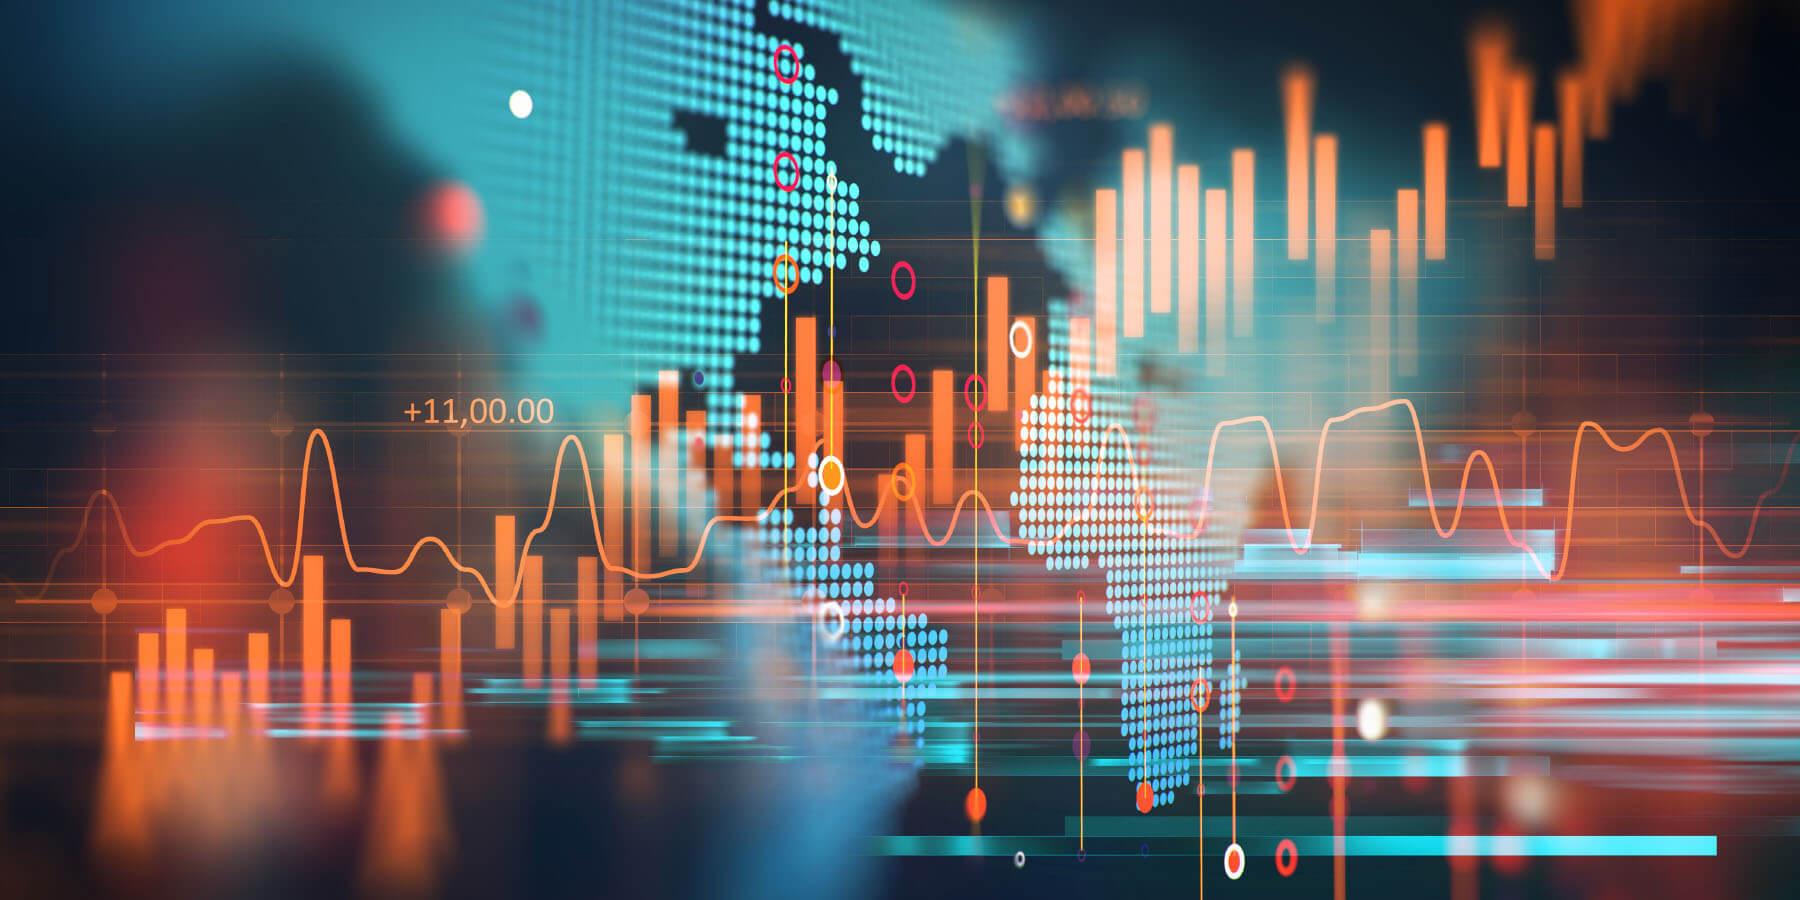 Financial Organization Virtualizes SAP & Seamlessly Migrates Legacy System